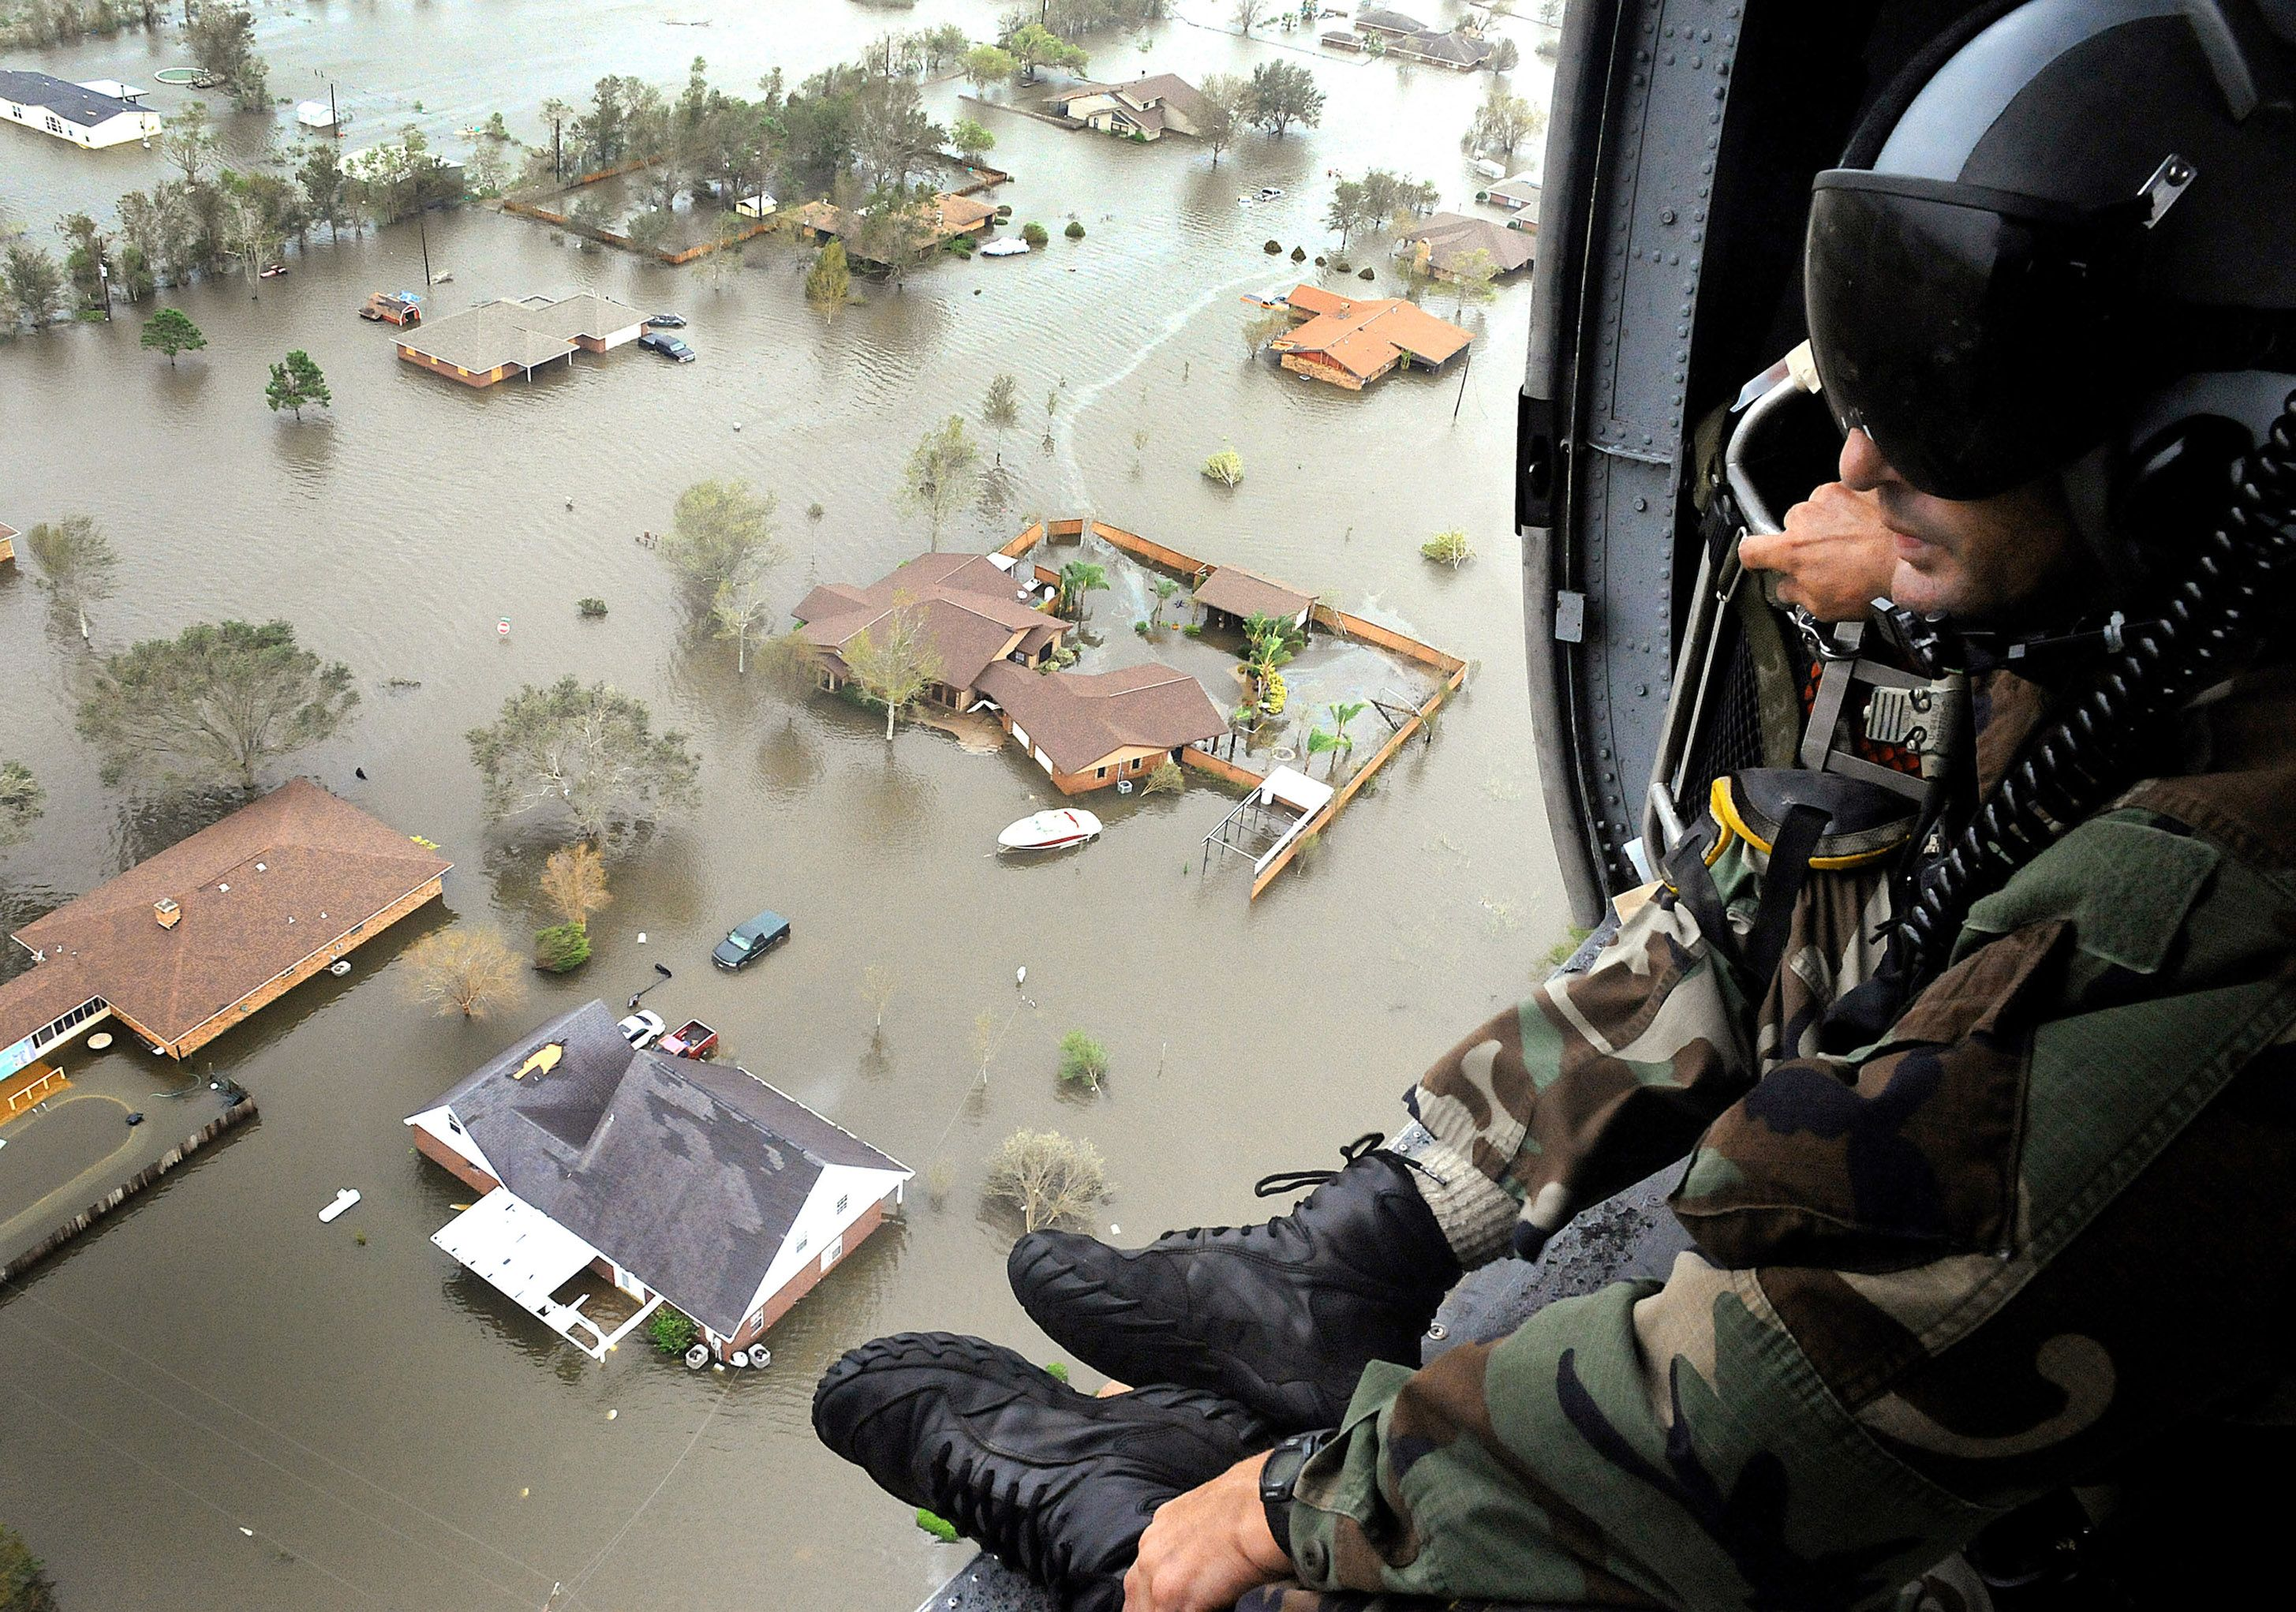 Hurricane damage from Ike in Nederland, Texas.